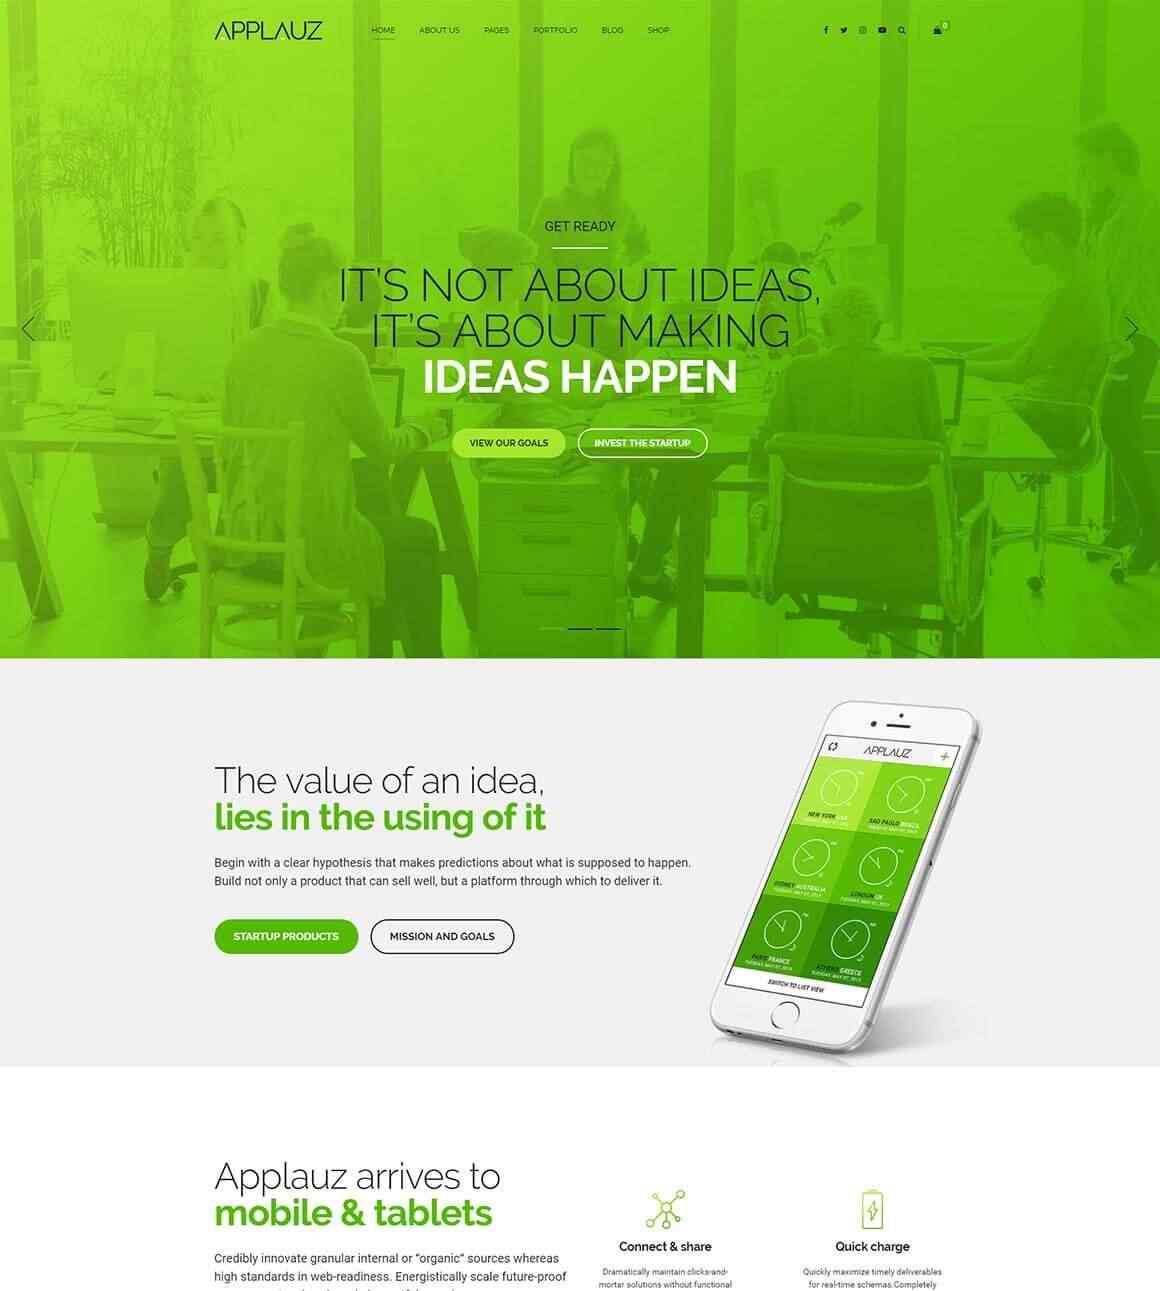 https://ebaco.sk/wp-content/uploads/2017/11/Screenshot-Startup.jpg